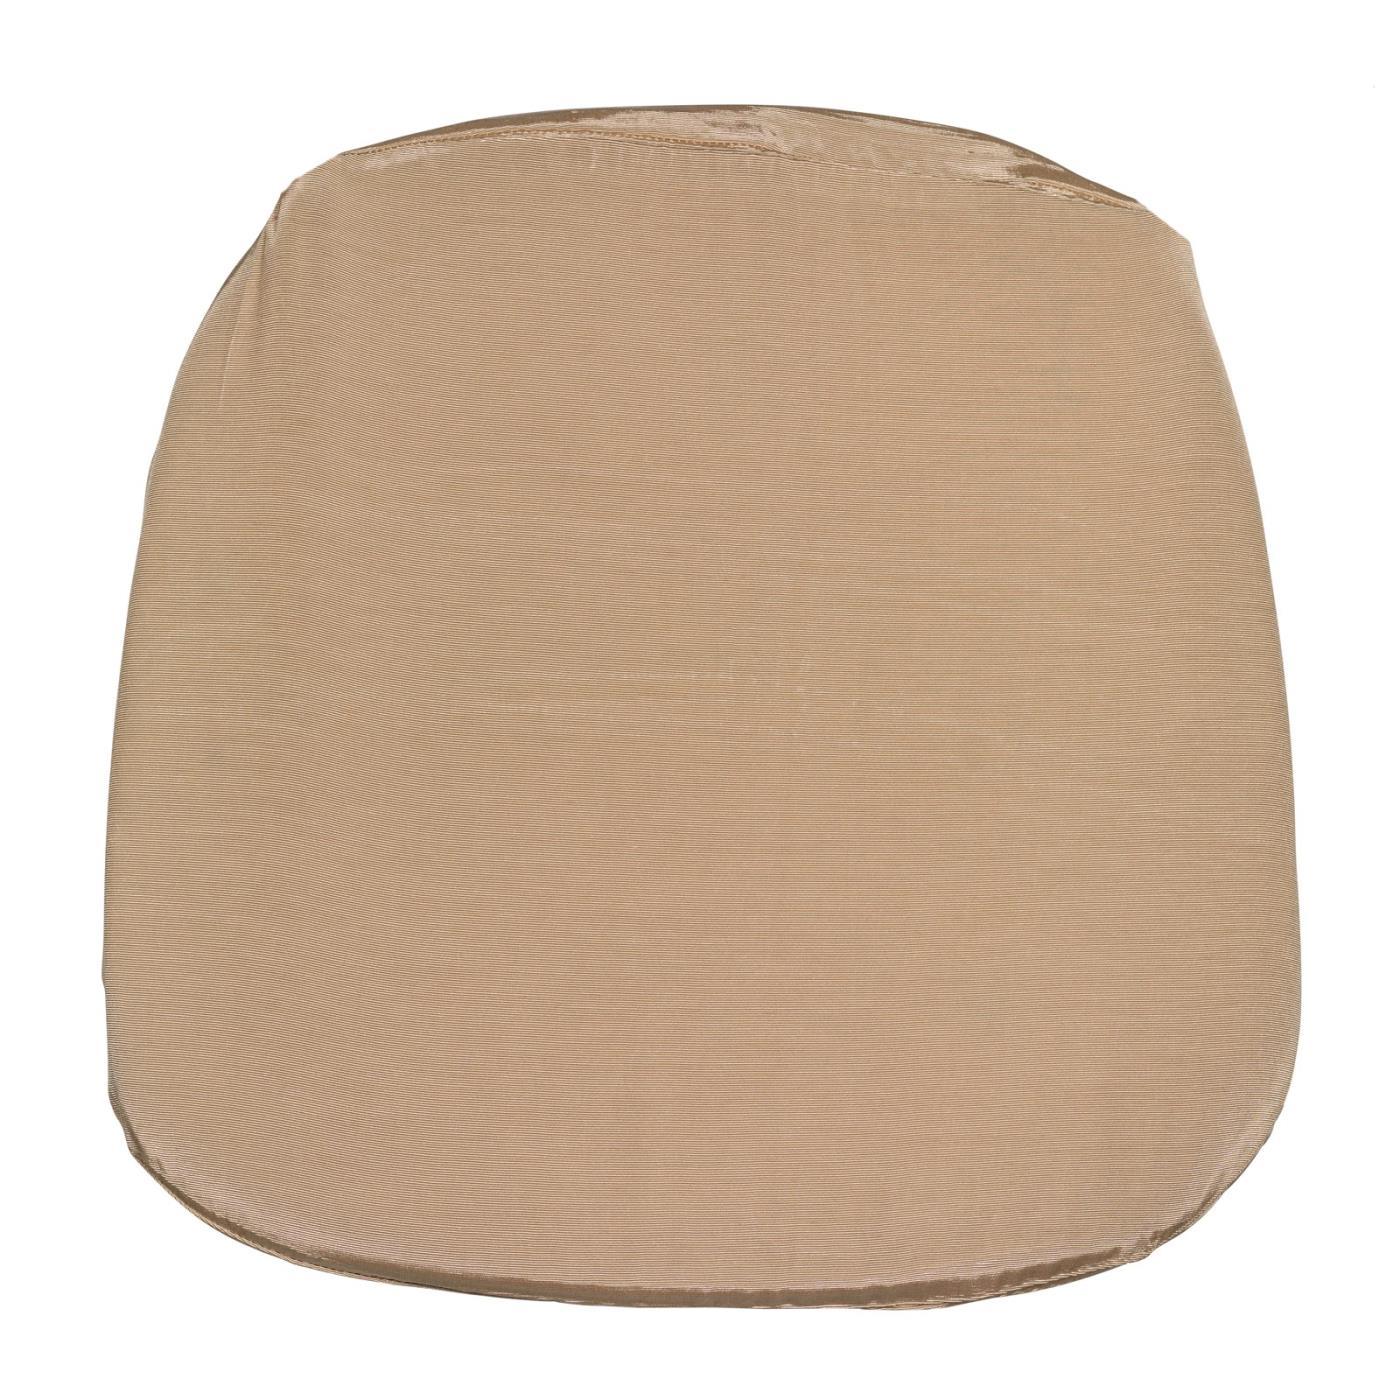 Bengaline Seat Cushion - Beige